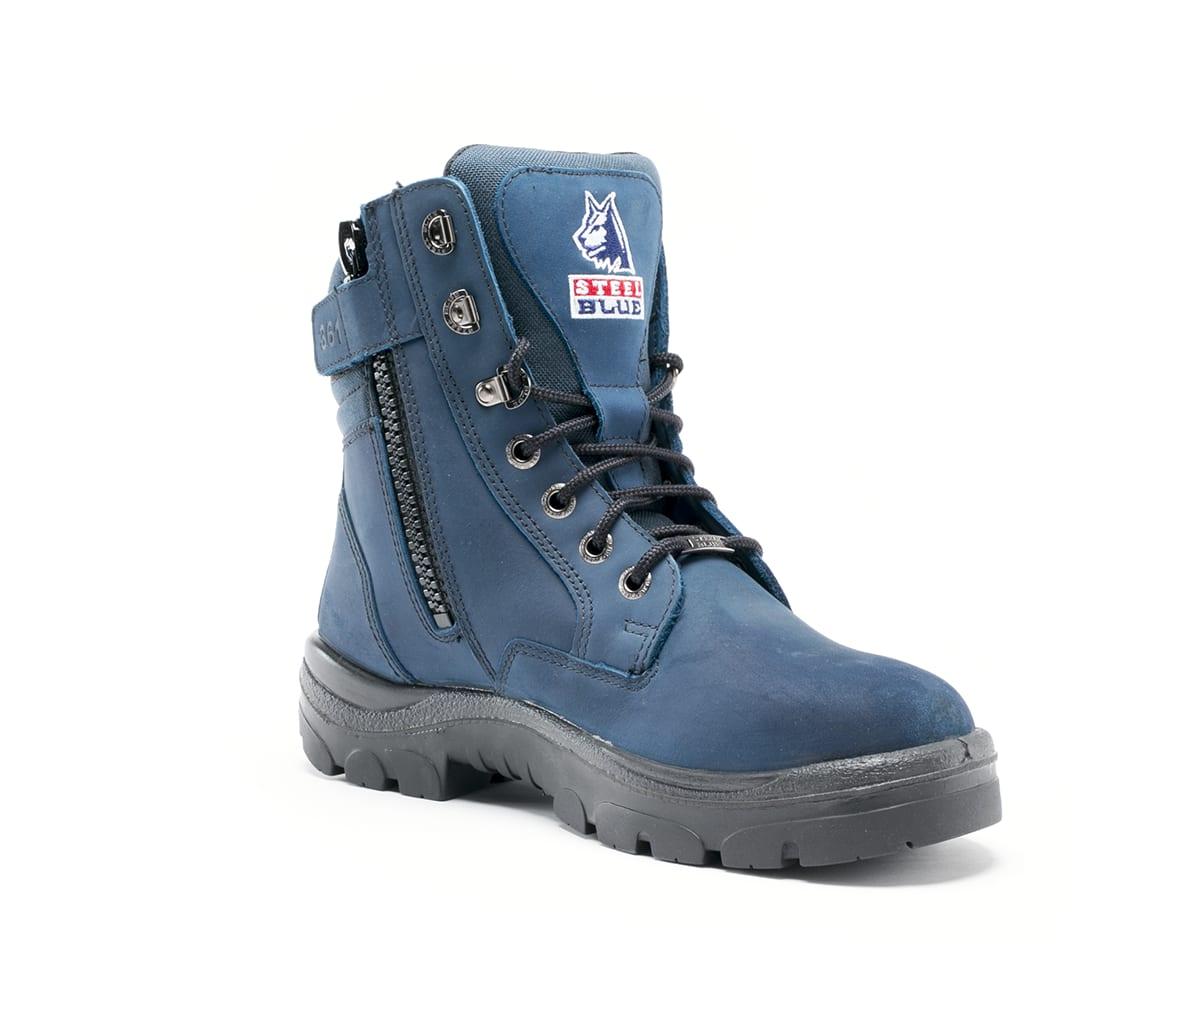 Southern Cross® Zip Blue Work \u0026 Safety